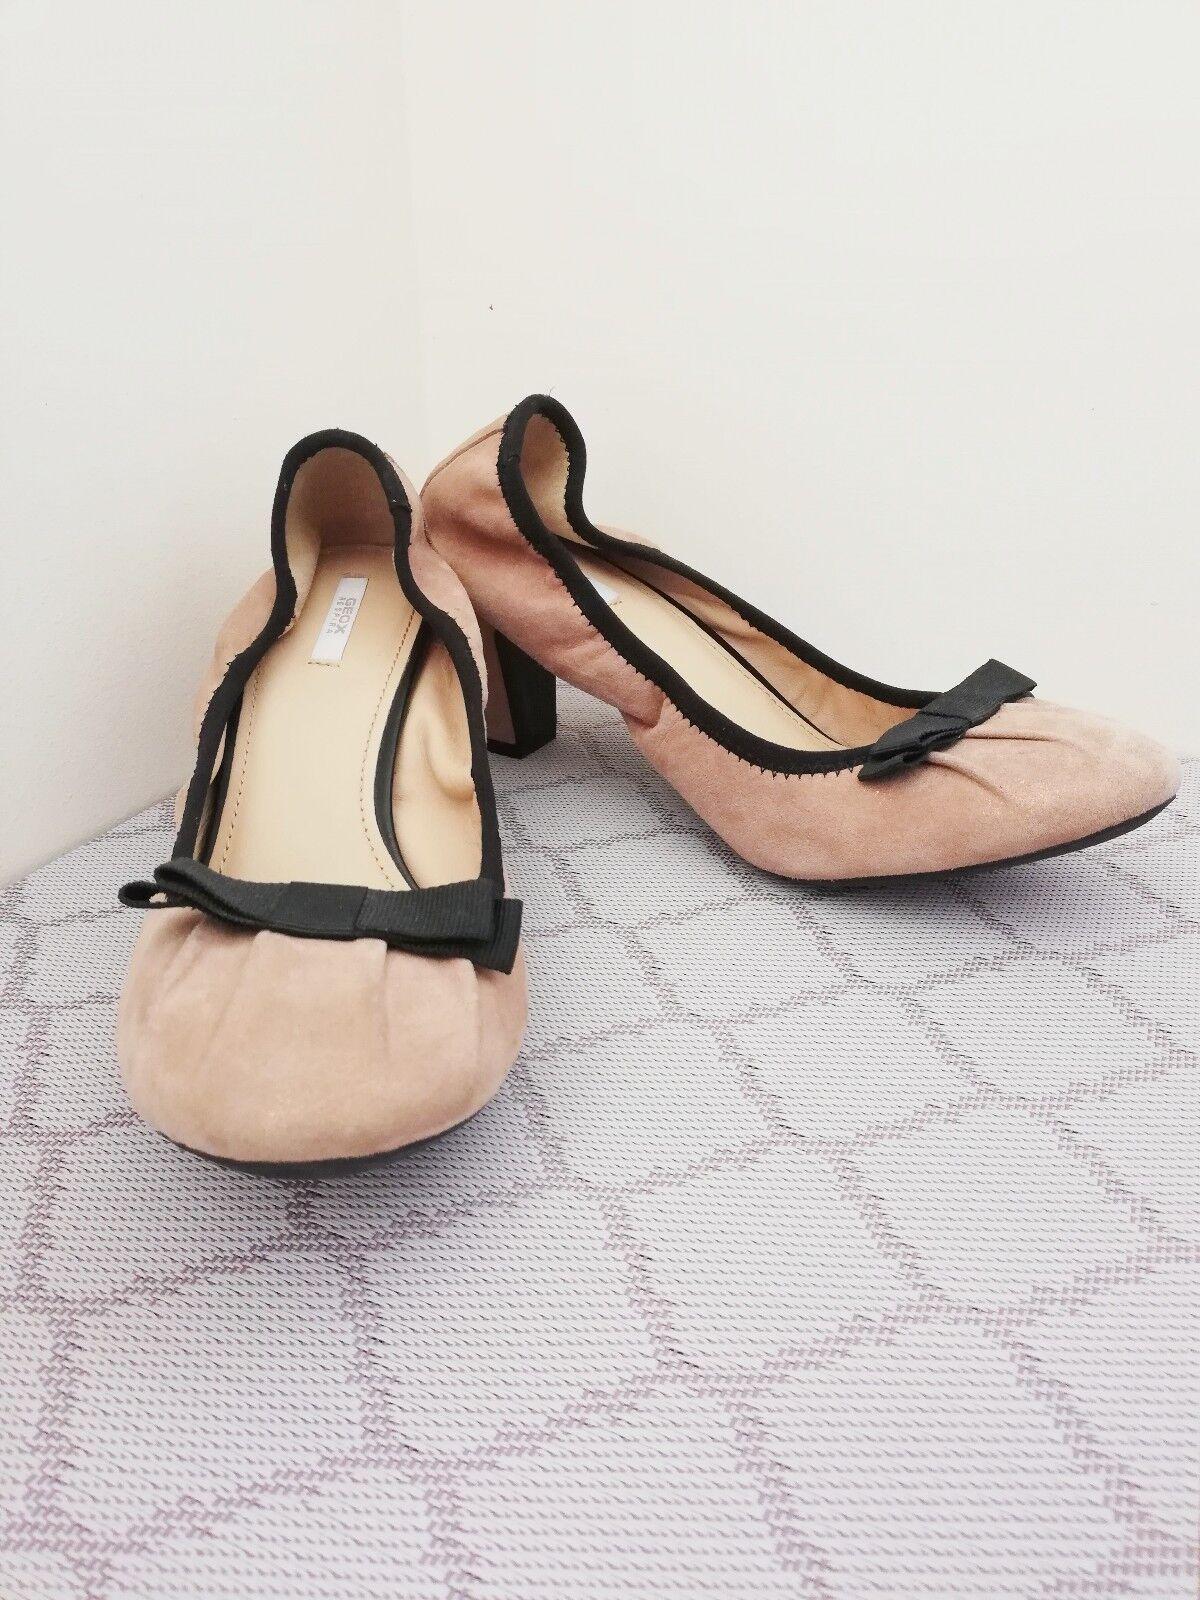 Geox respira Nude Nude Nude rosado Cuero Zapatos Tribunal de detalle de arco Sparkle for EU39 UK6 US8.5 e3cfe8